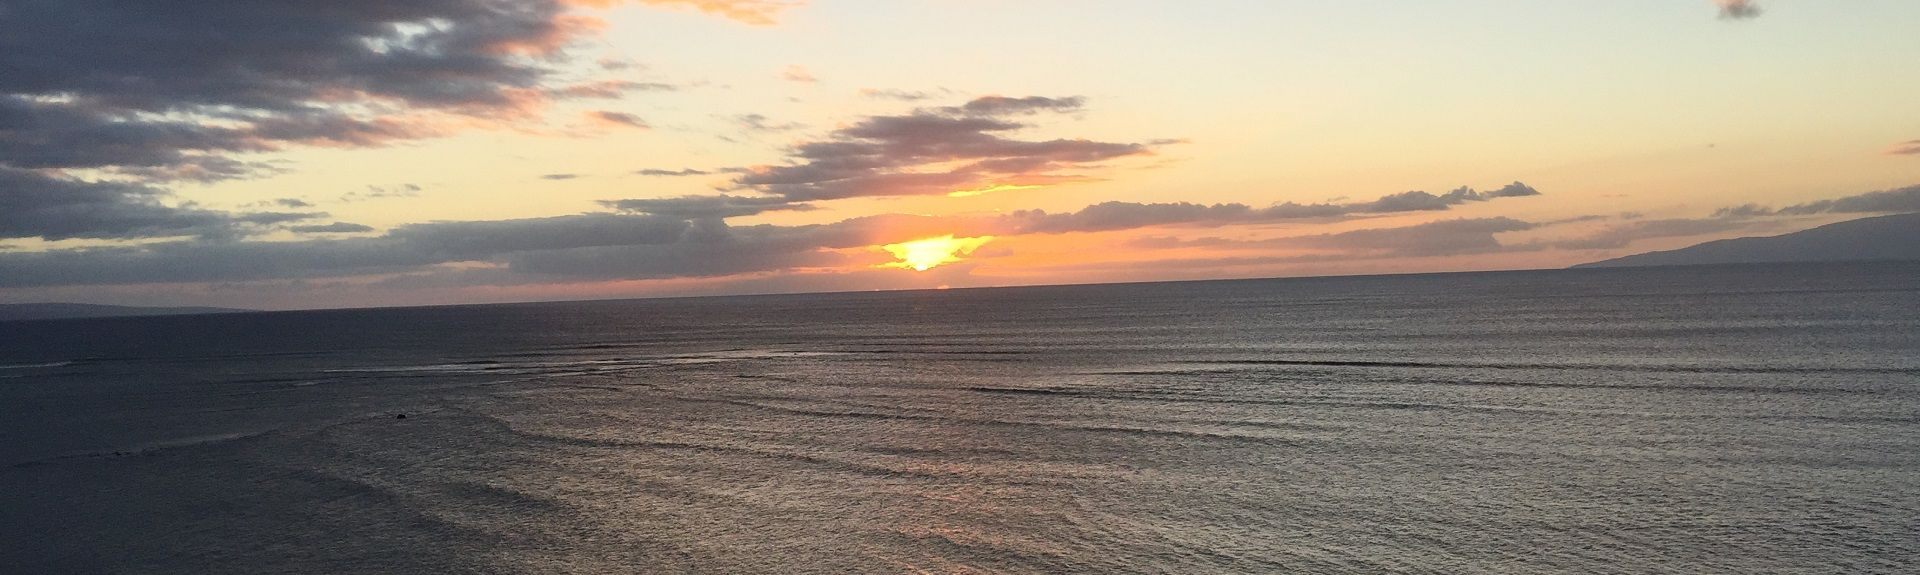 Menehune Shores, Kihei, HI, USA